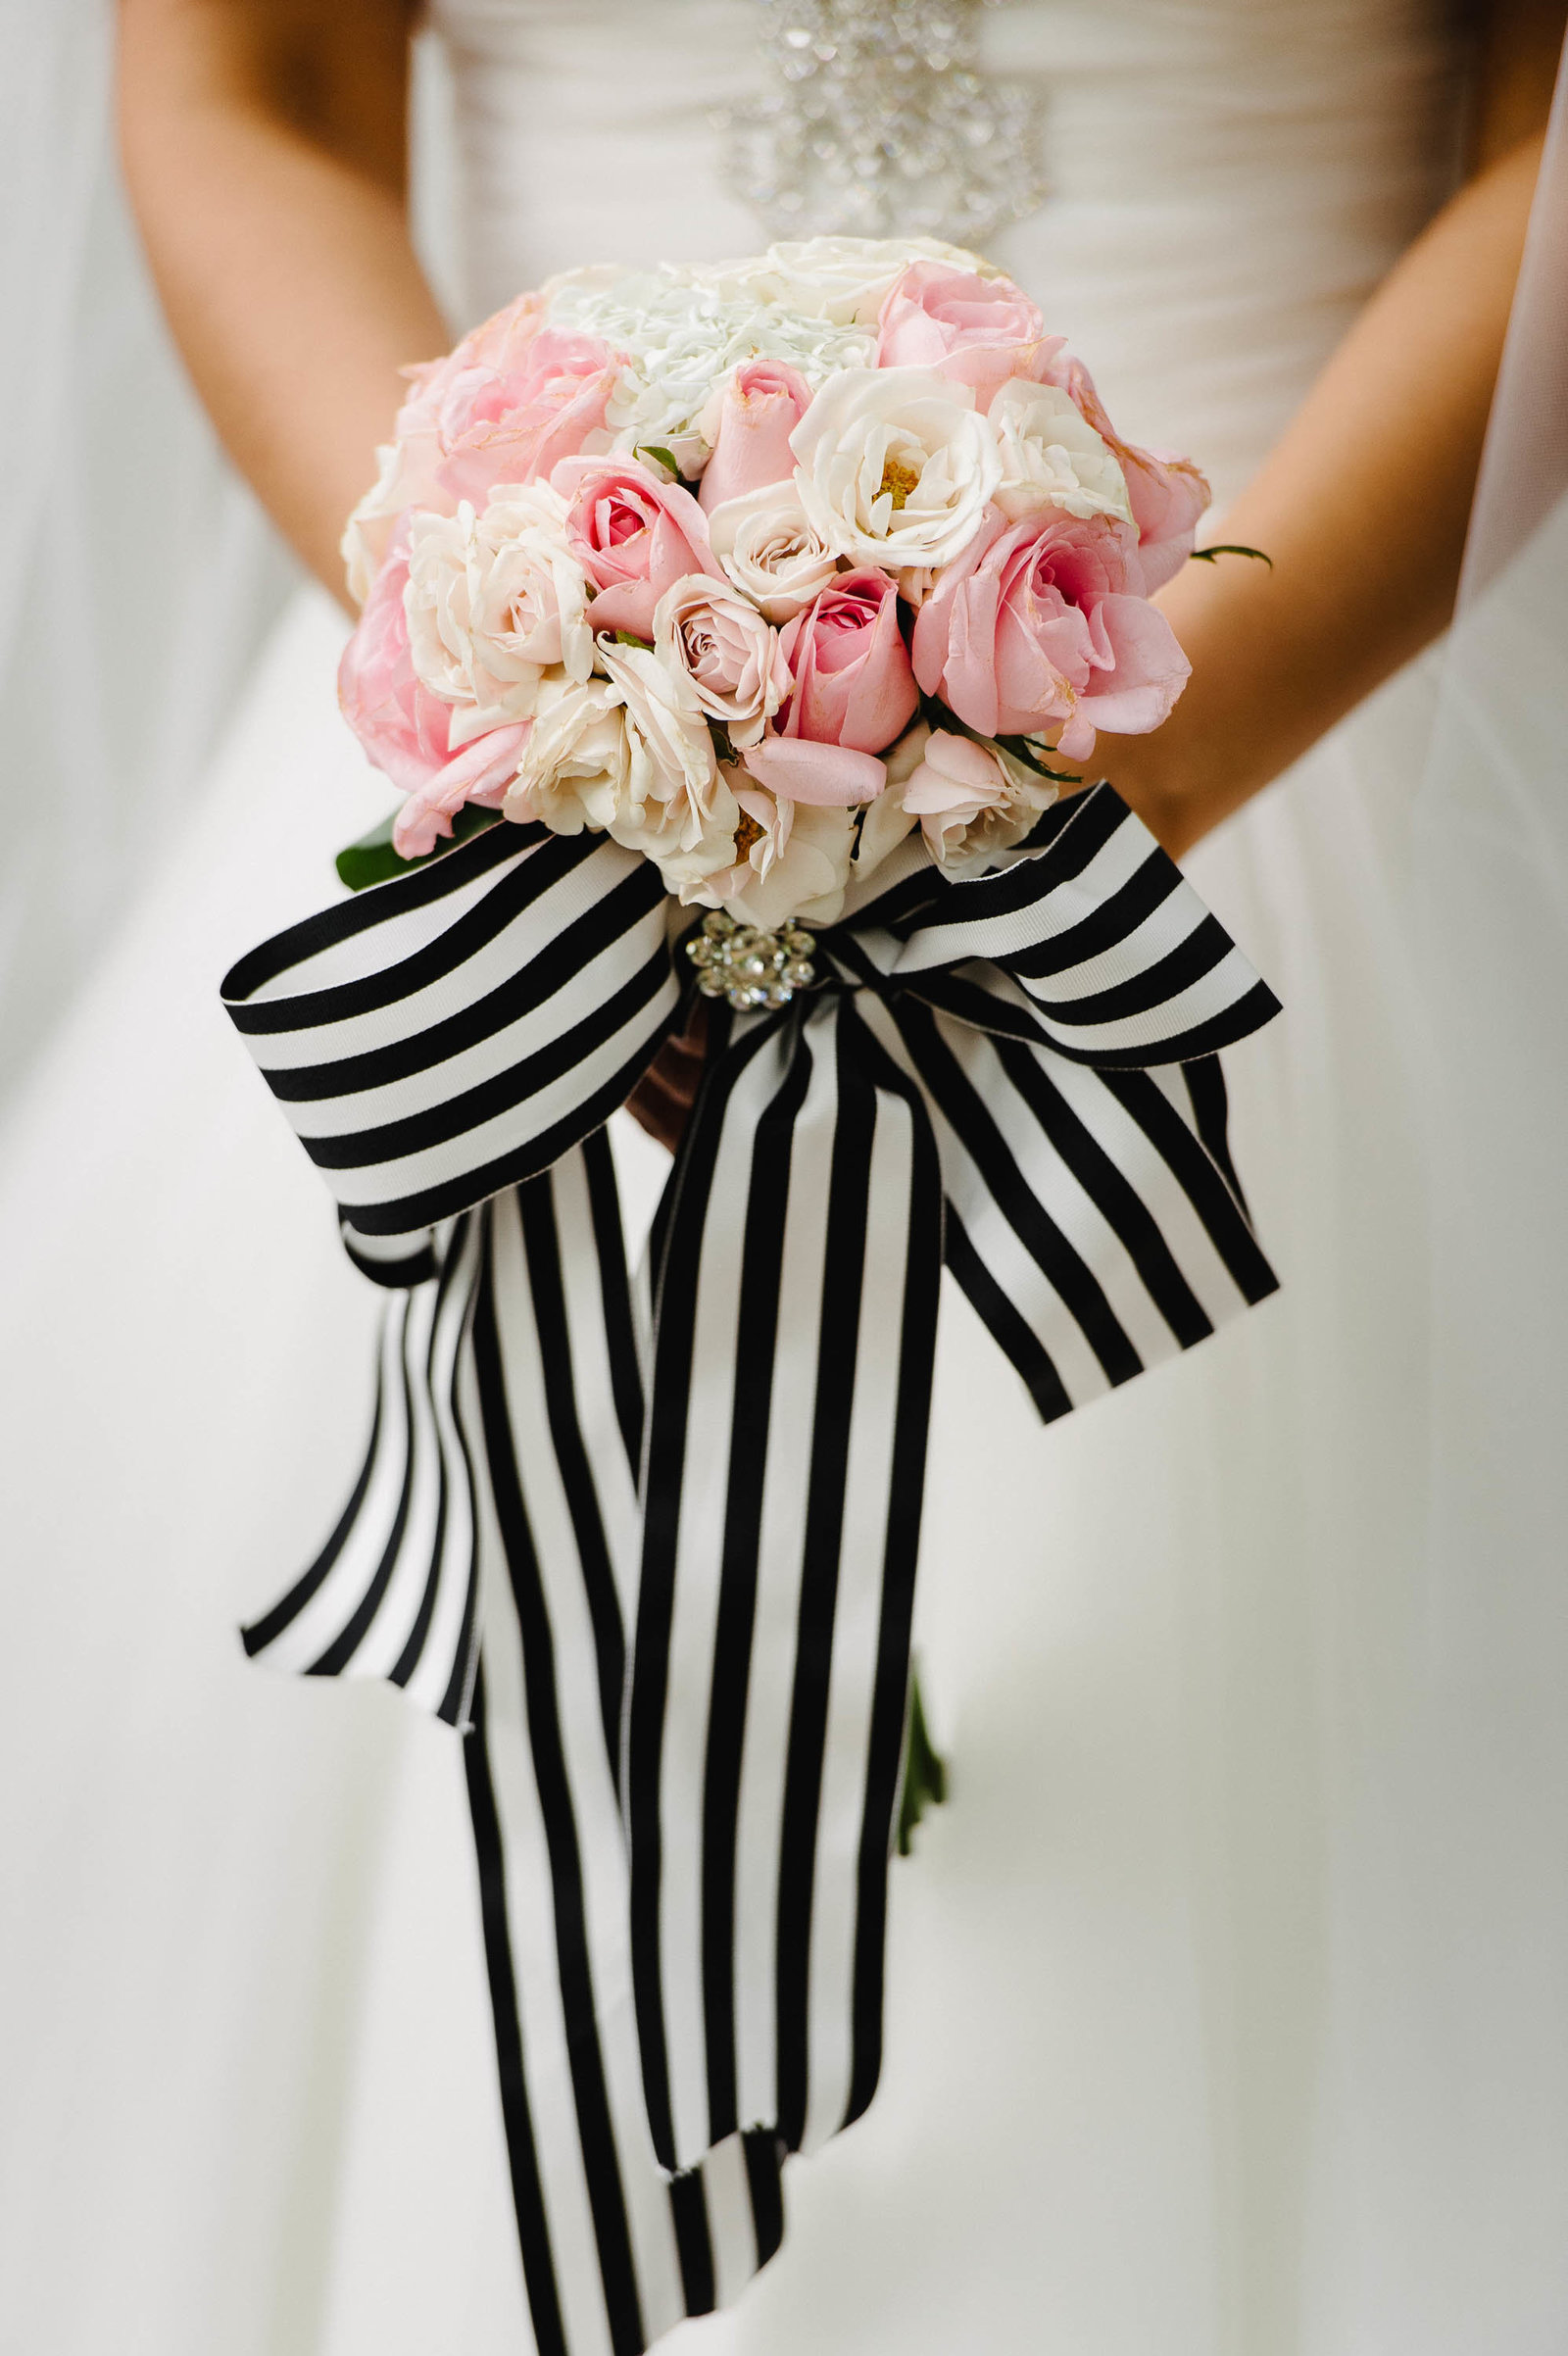 121-El-paso-wedding-photographer-El Paso Wedding Photographer_D14